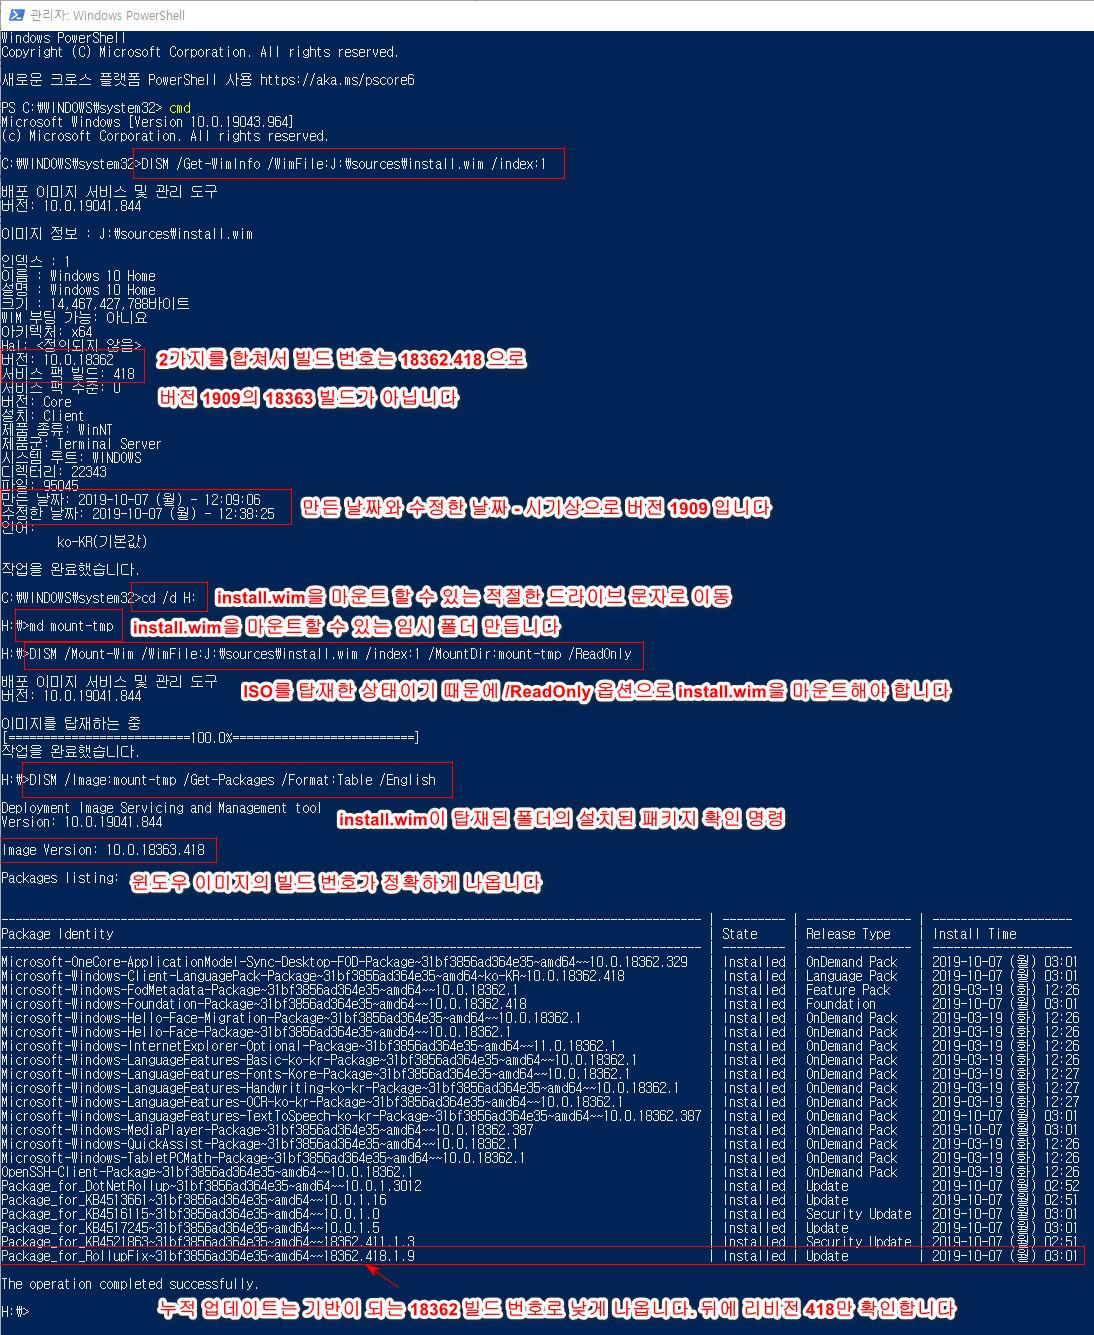 Windows iso의 정확한 빌드 번호는 install.wim을 탑재해야 확인이 가능합니다 - 버전 1909 - 2021-05-11_131858.jpg